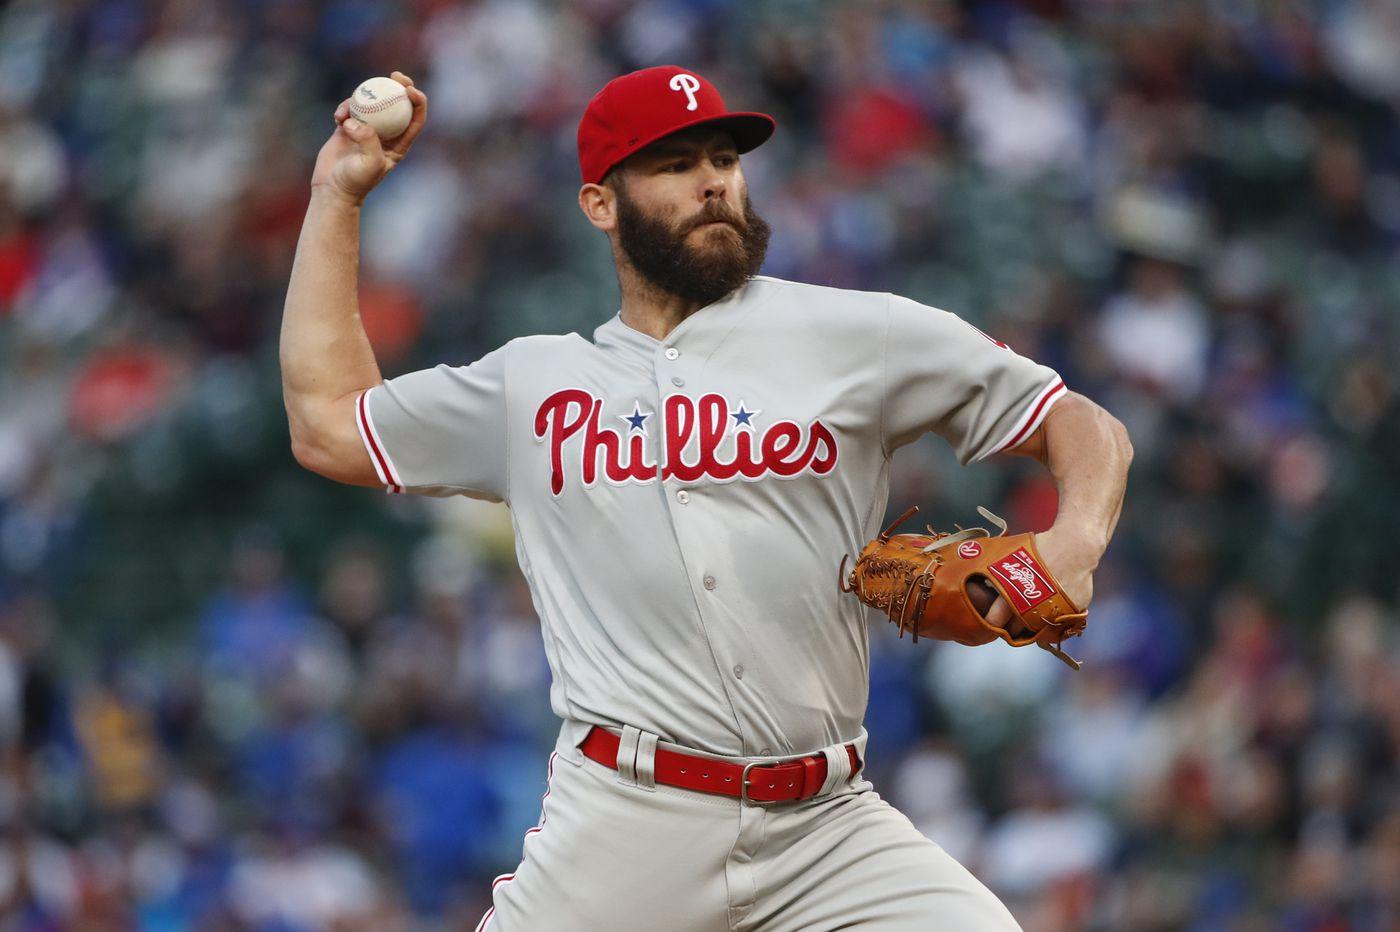 Phillies beat Brewers behind Jake Arrieta's impressive eight innings